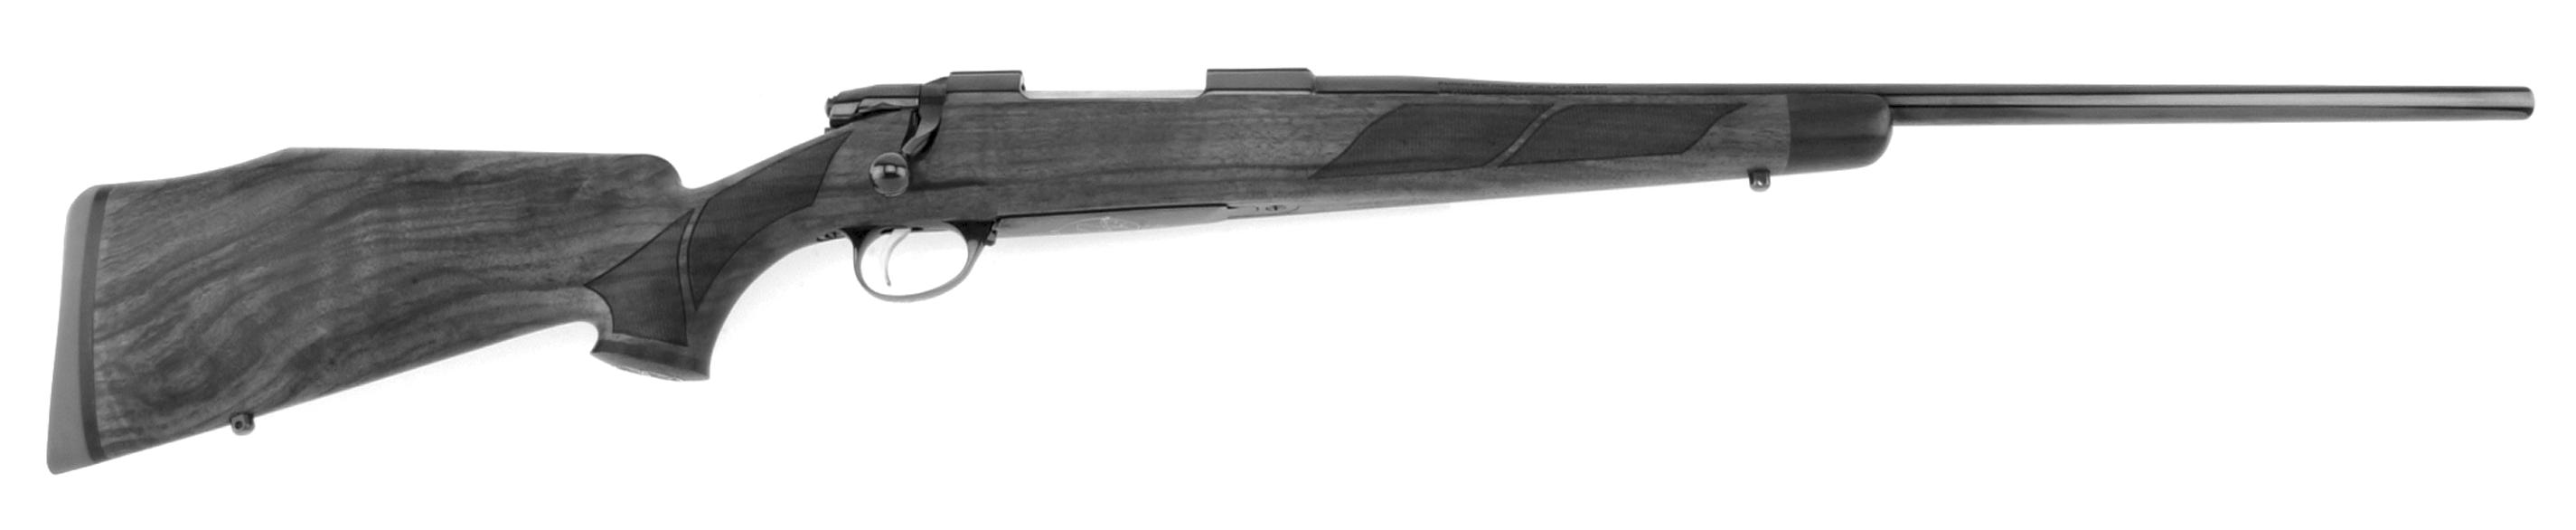 Model 75 Custom Deluxe